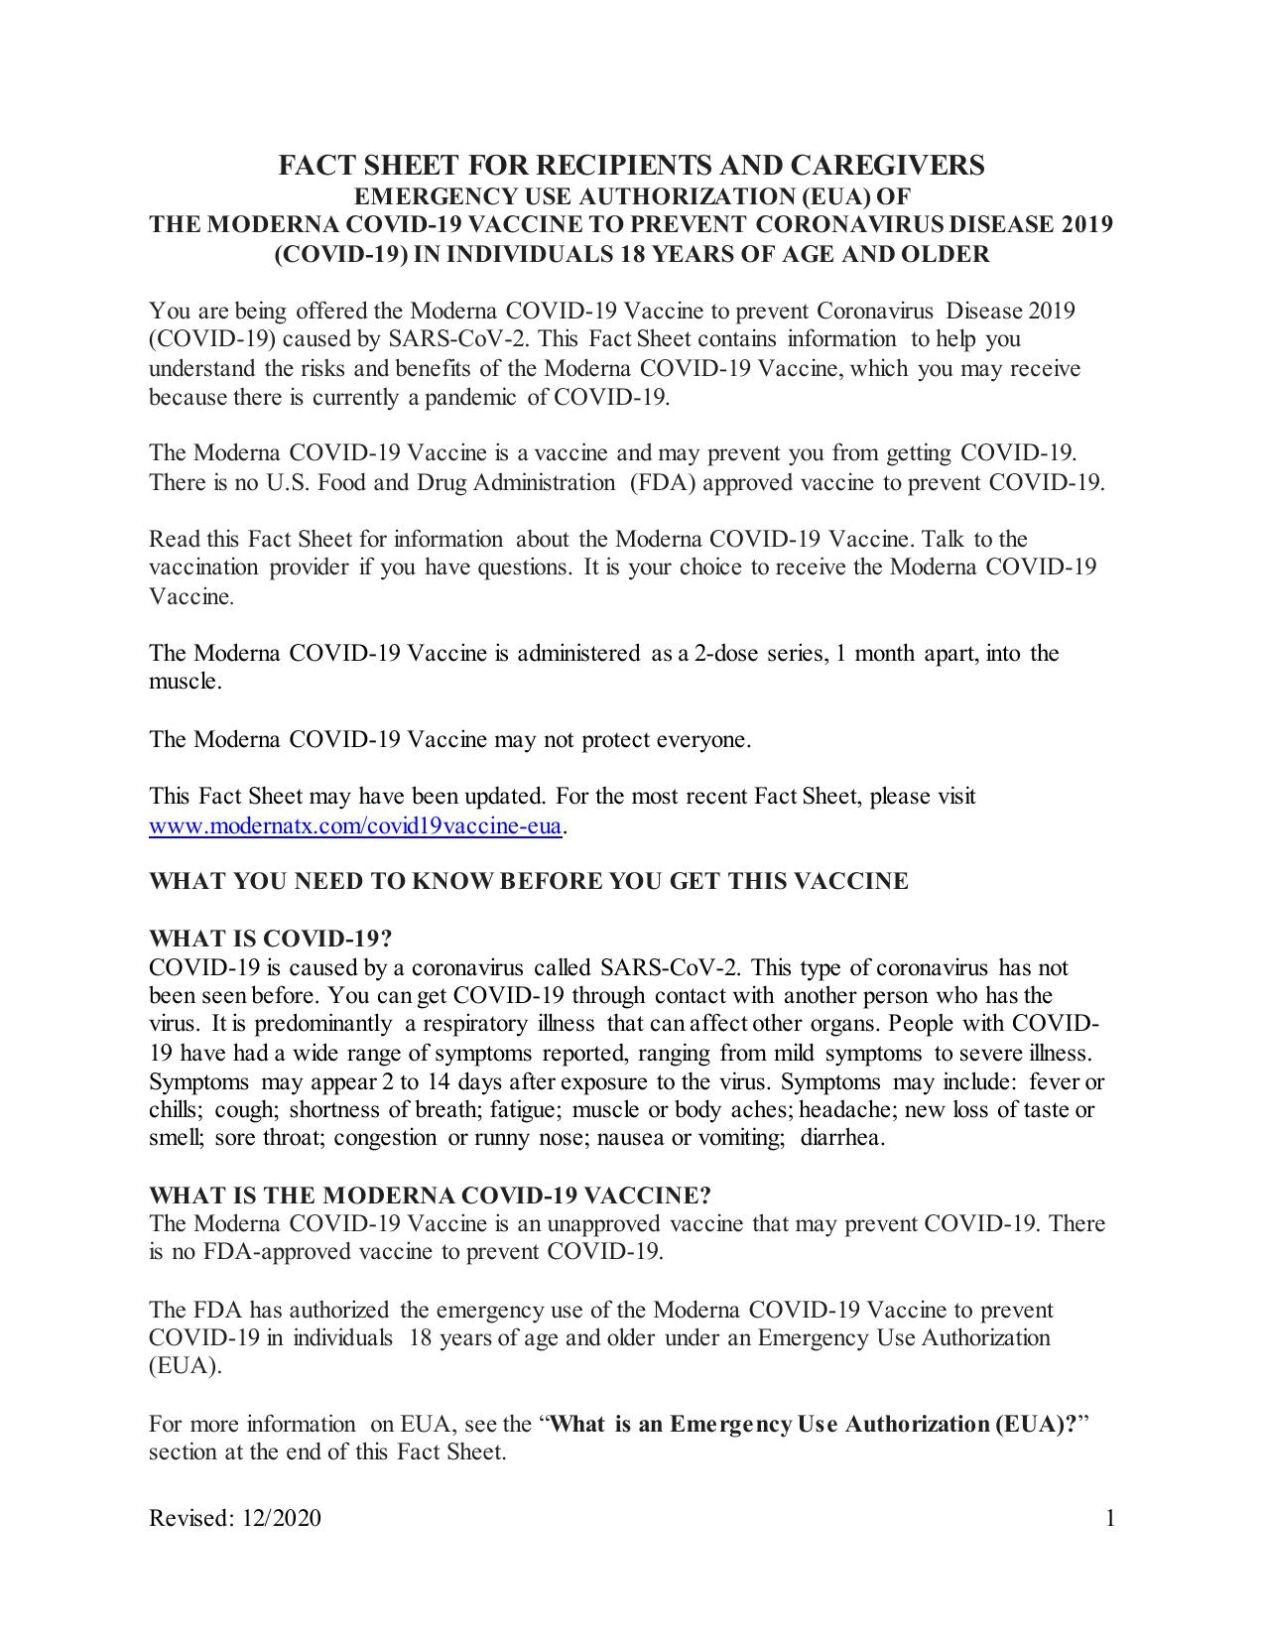 COVID vaccine authorization form